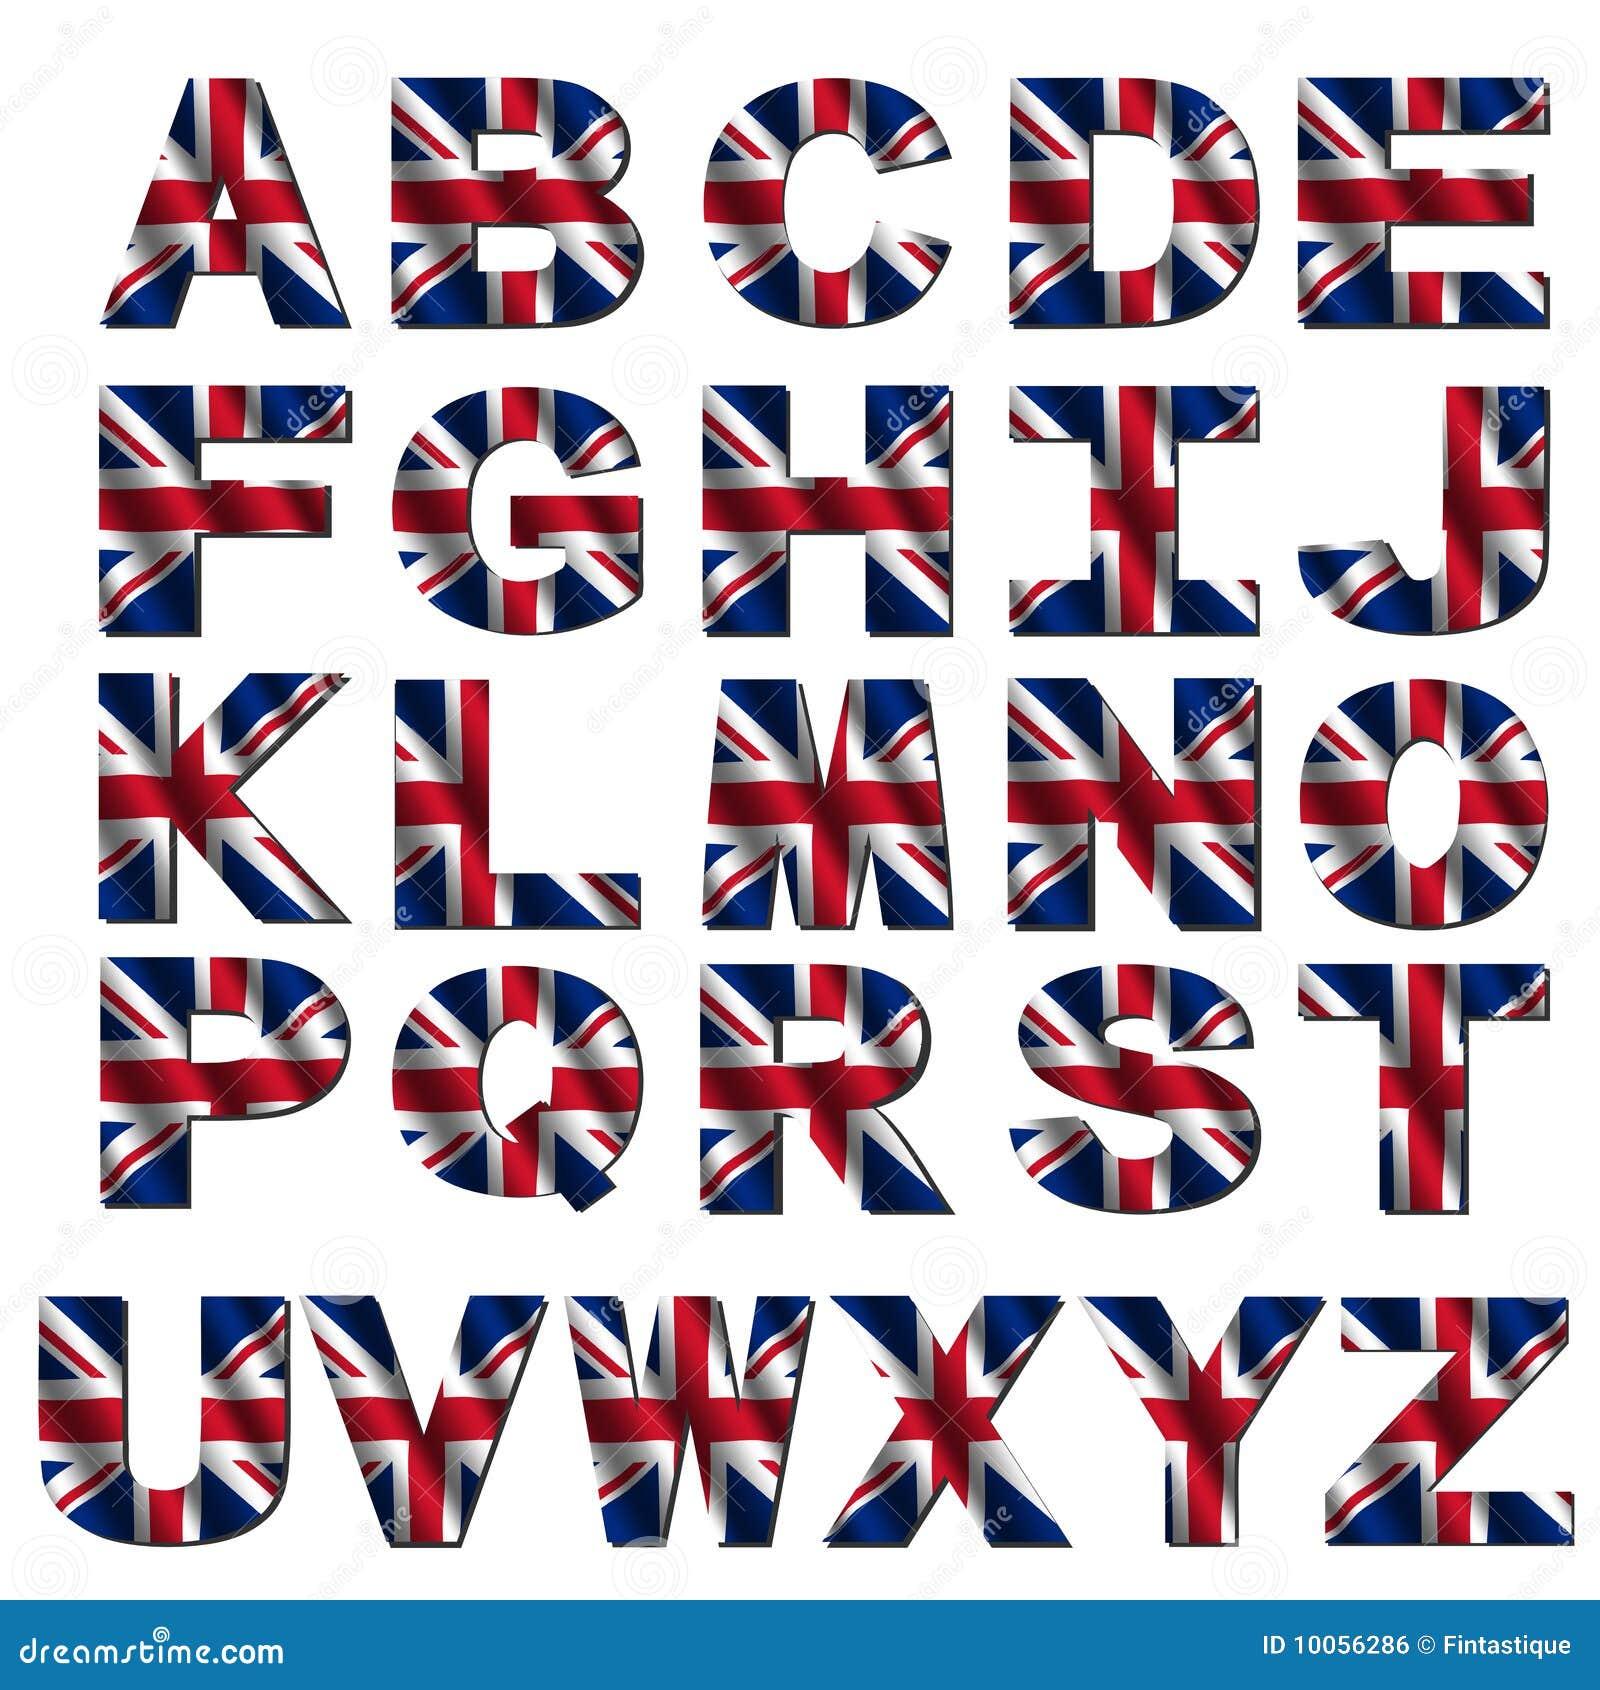 Pia batismal britânica da bandeira